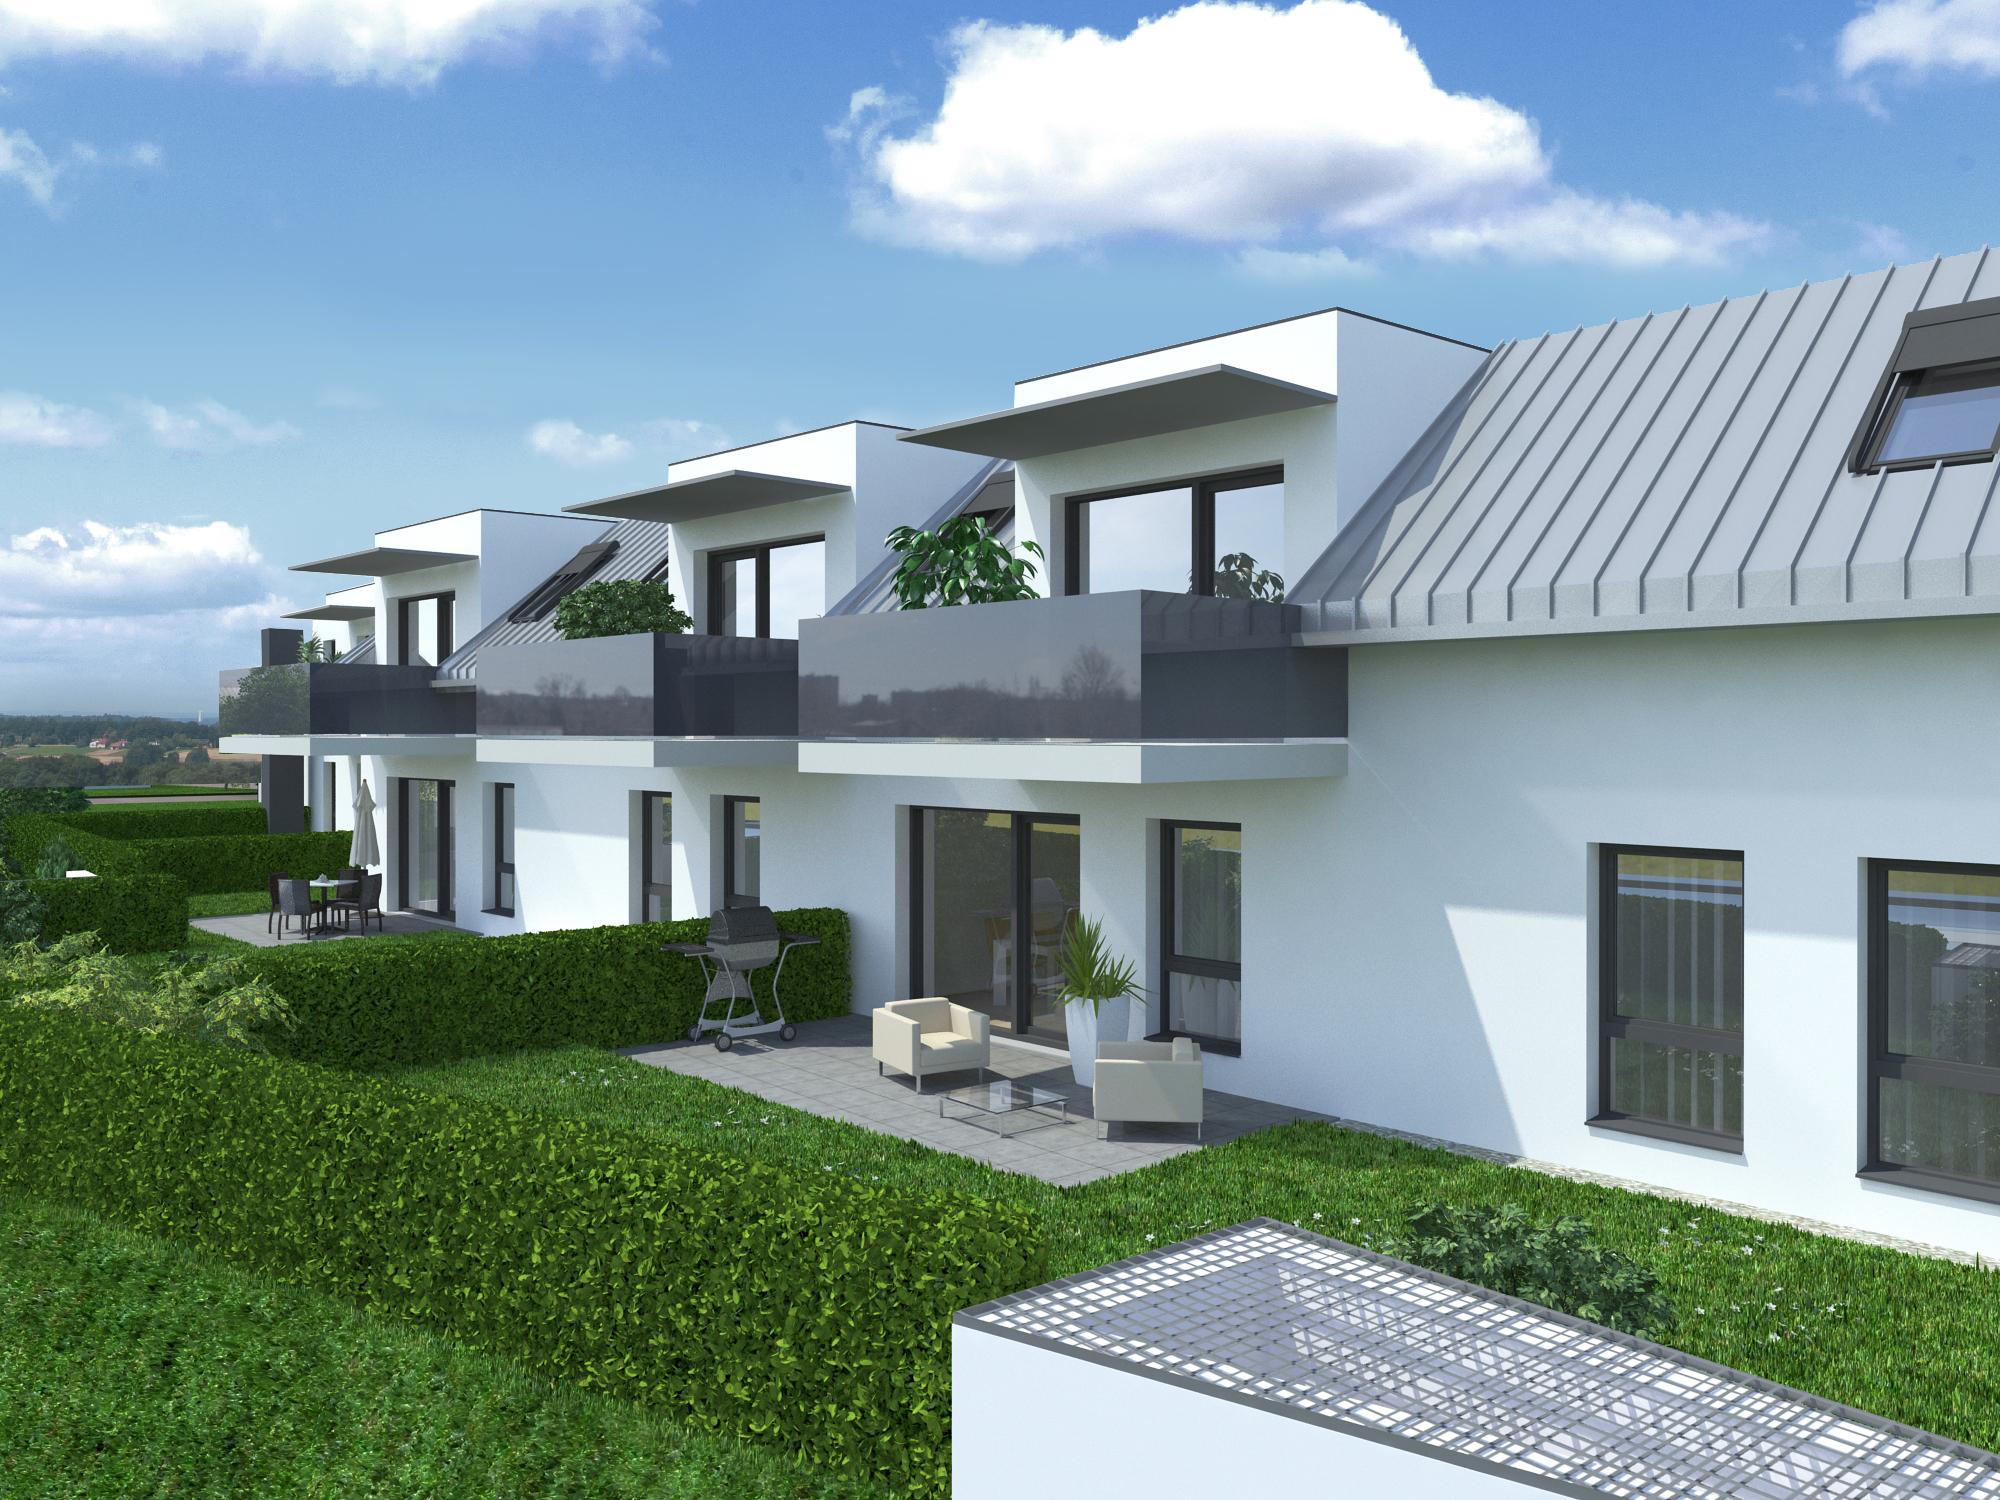 Leon207 b3 architektur for Architektur 2017